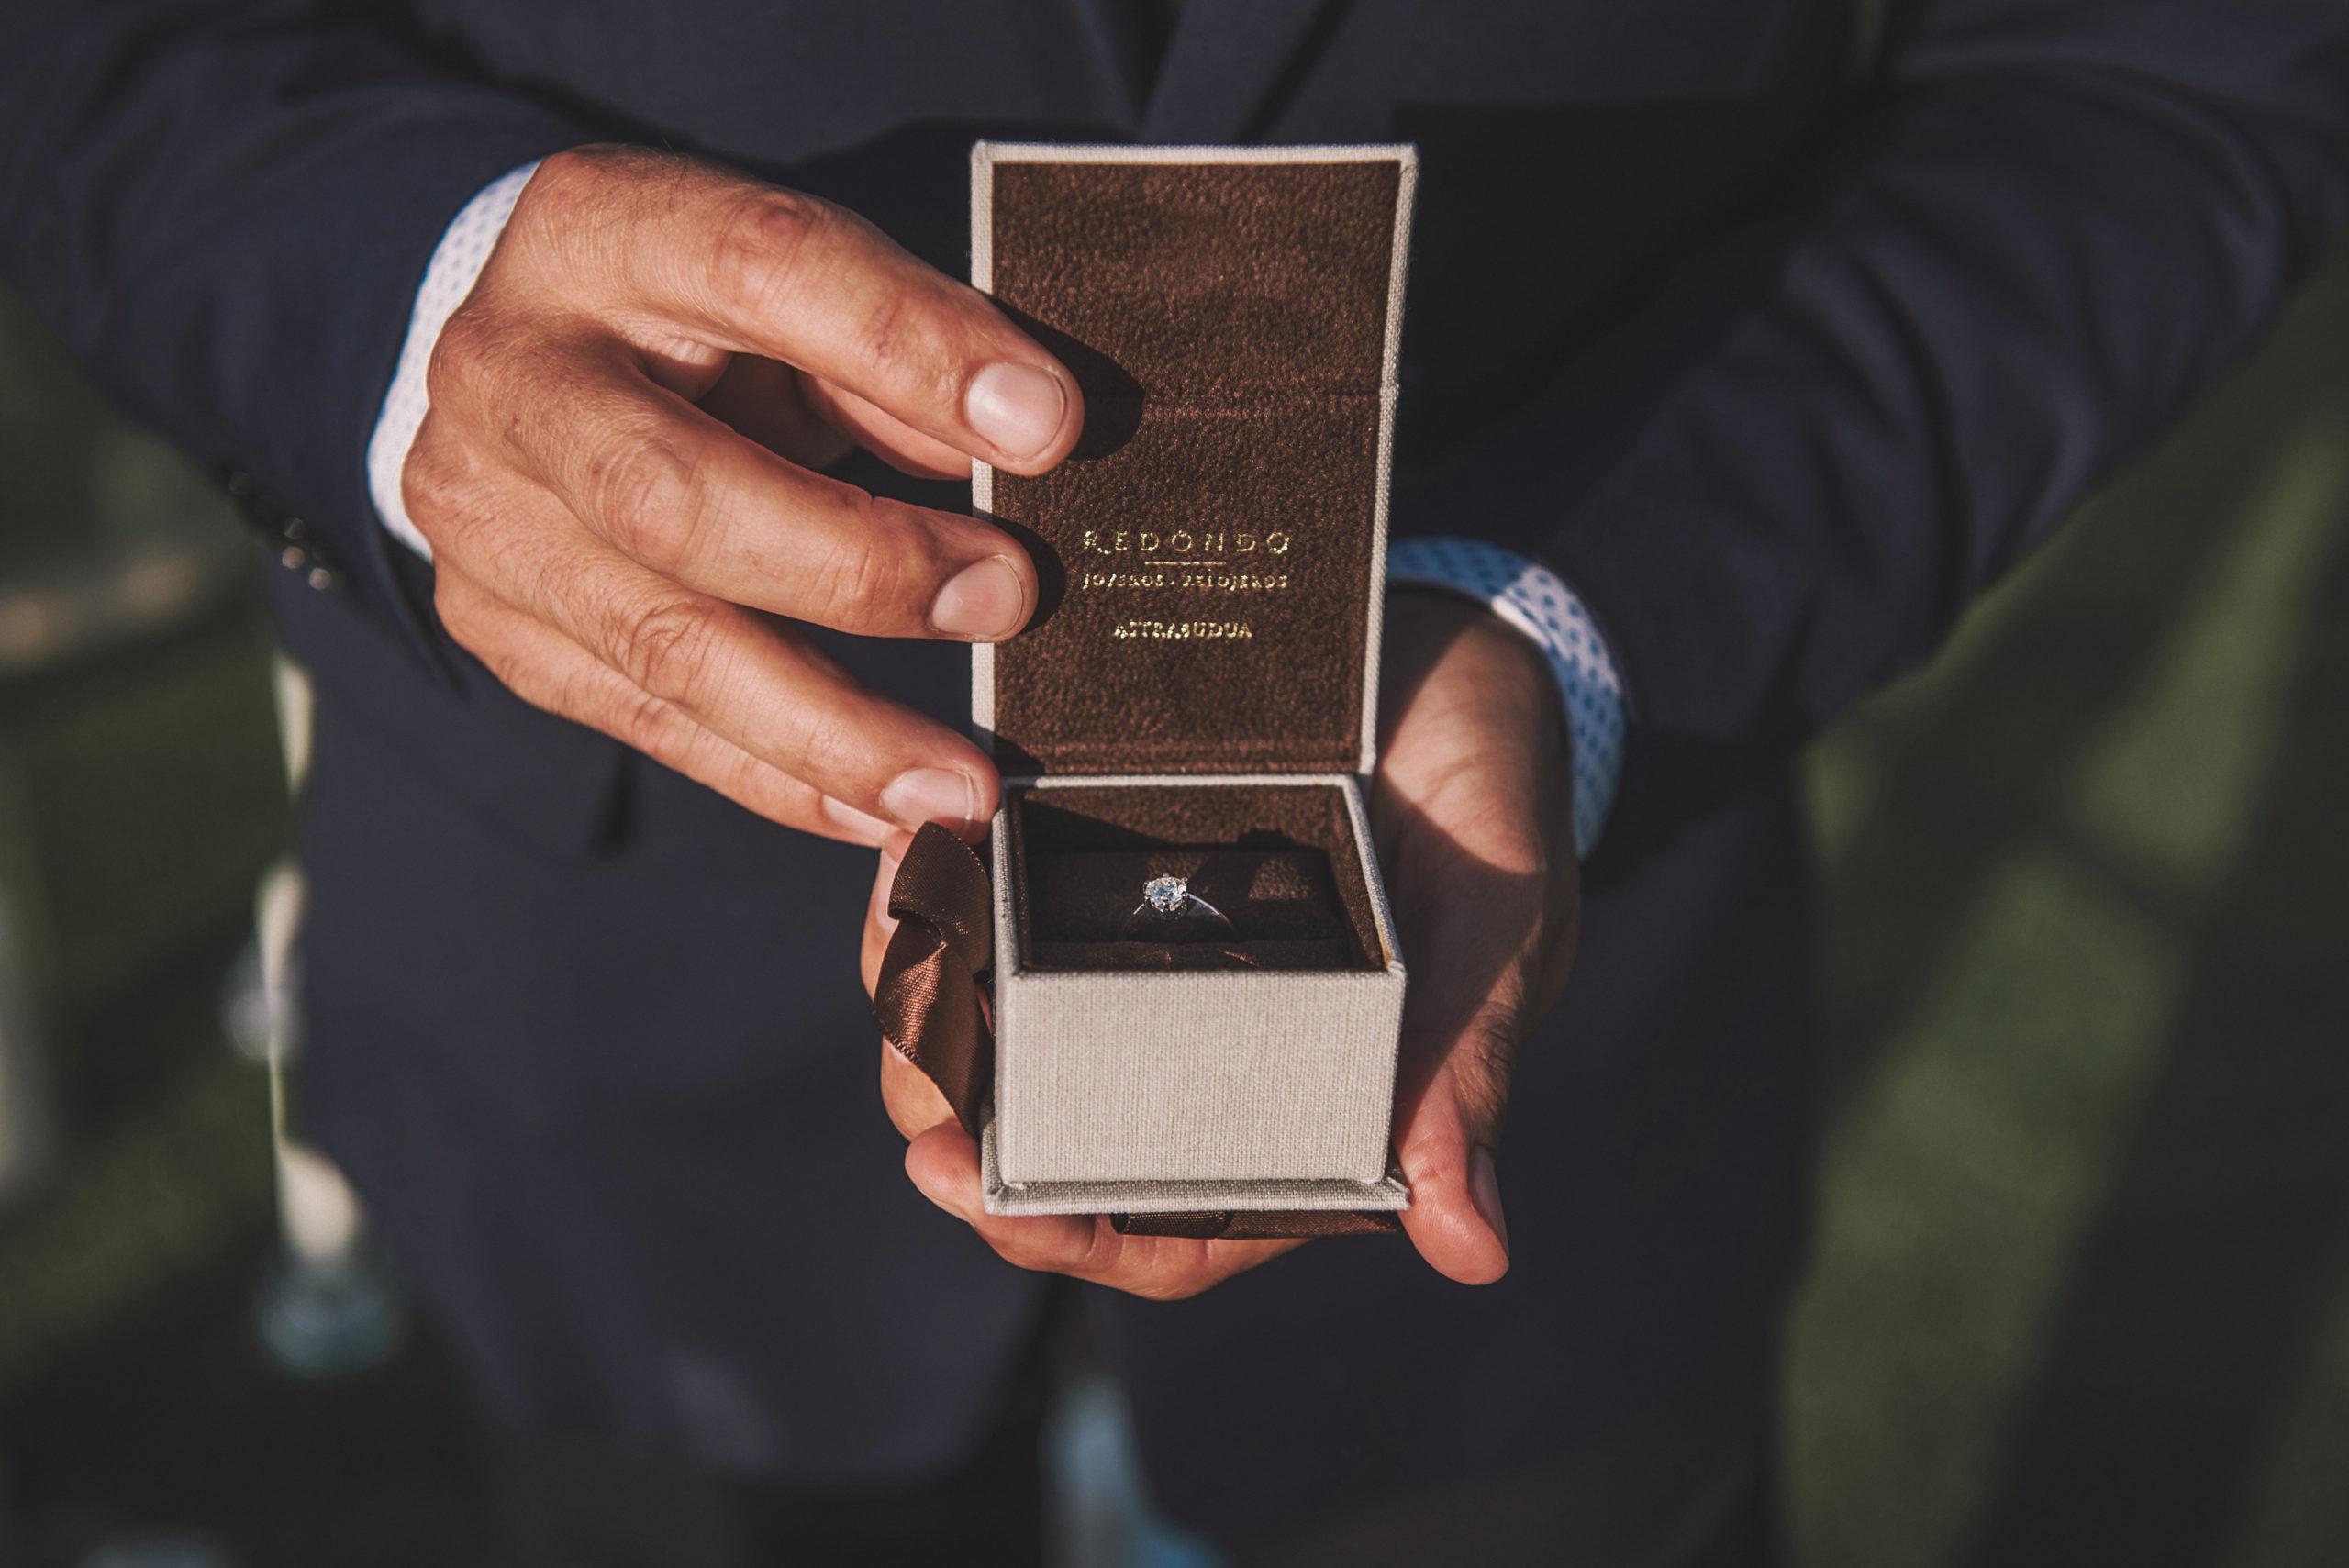 Novio con caja de anillo de pedida de Redondo Joyeros entre las manos